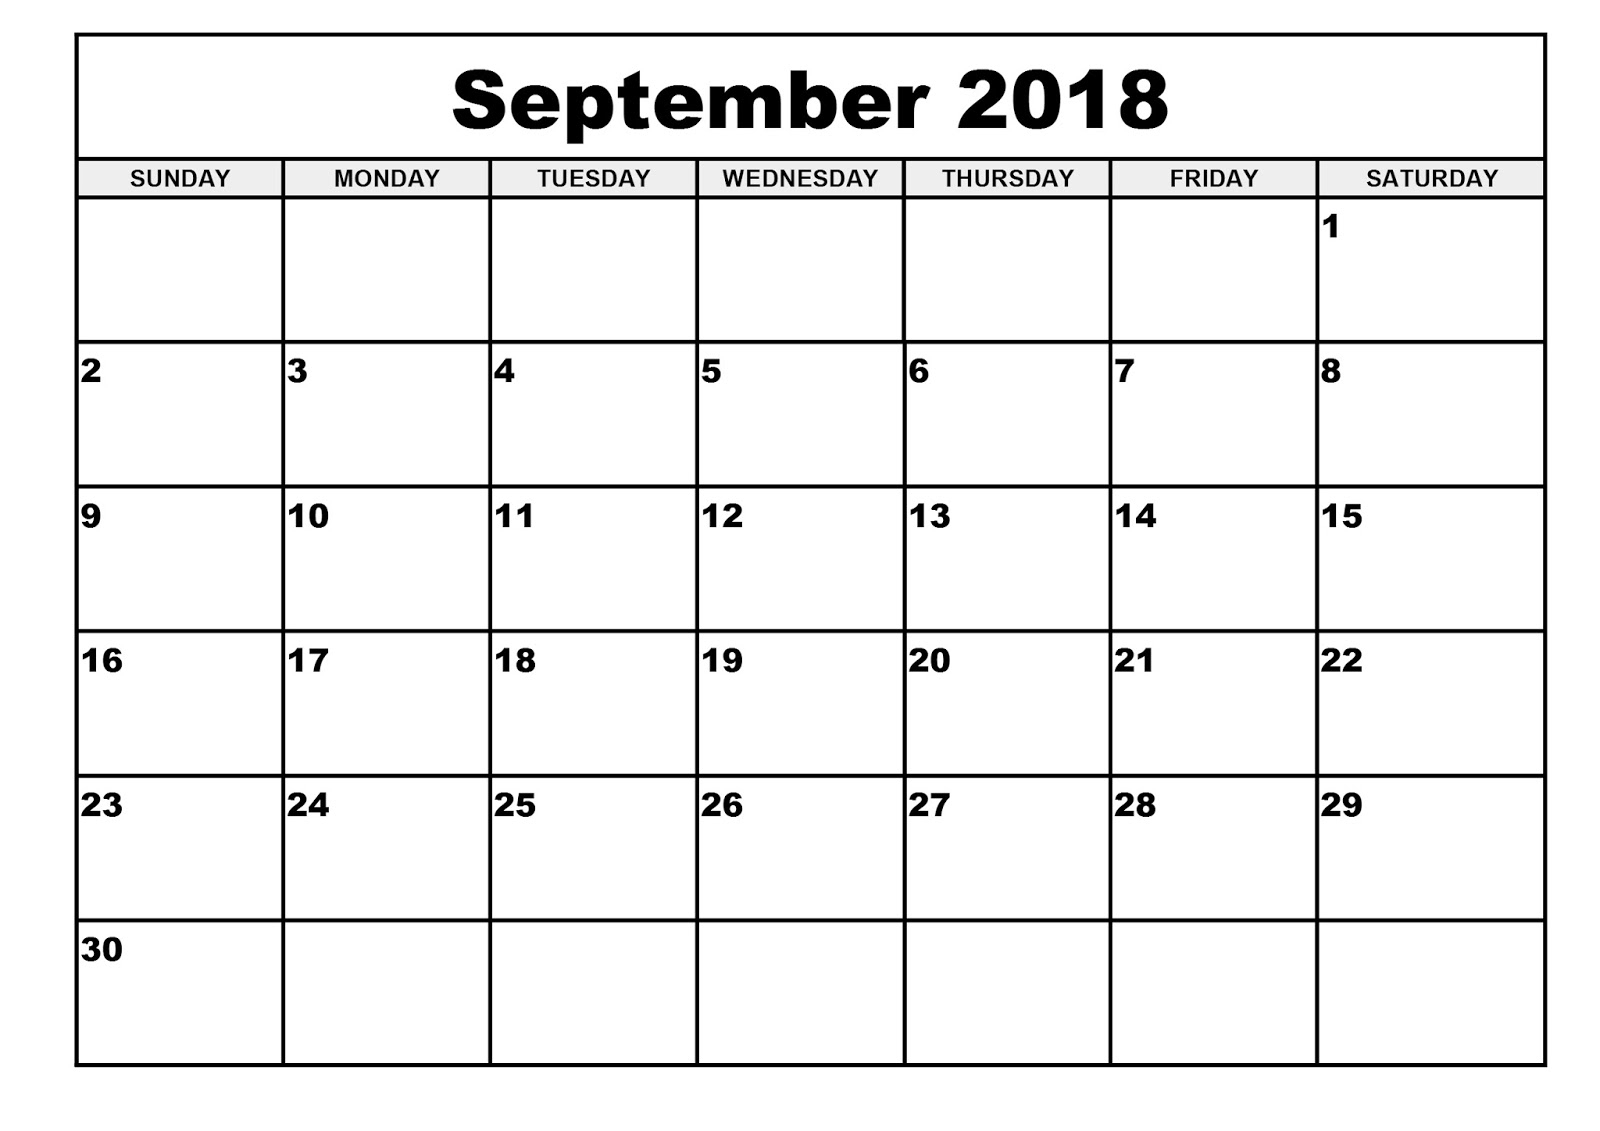 Free September 2018 Printable Calendar Blank Templates - Calendar pertaining to Blank Printable September Calendar Template